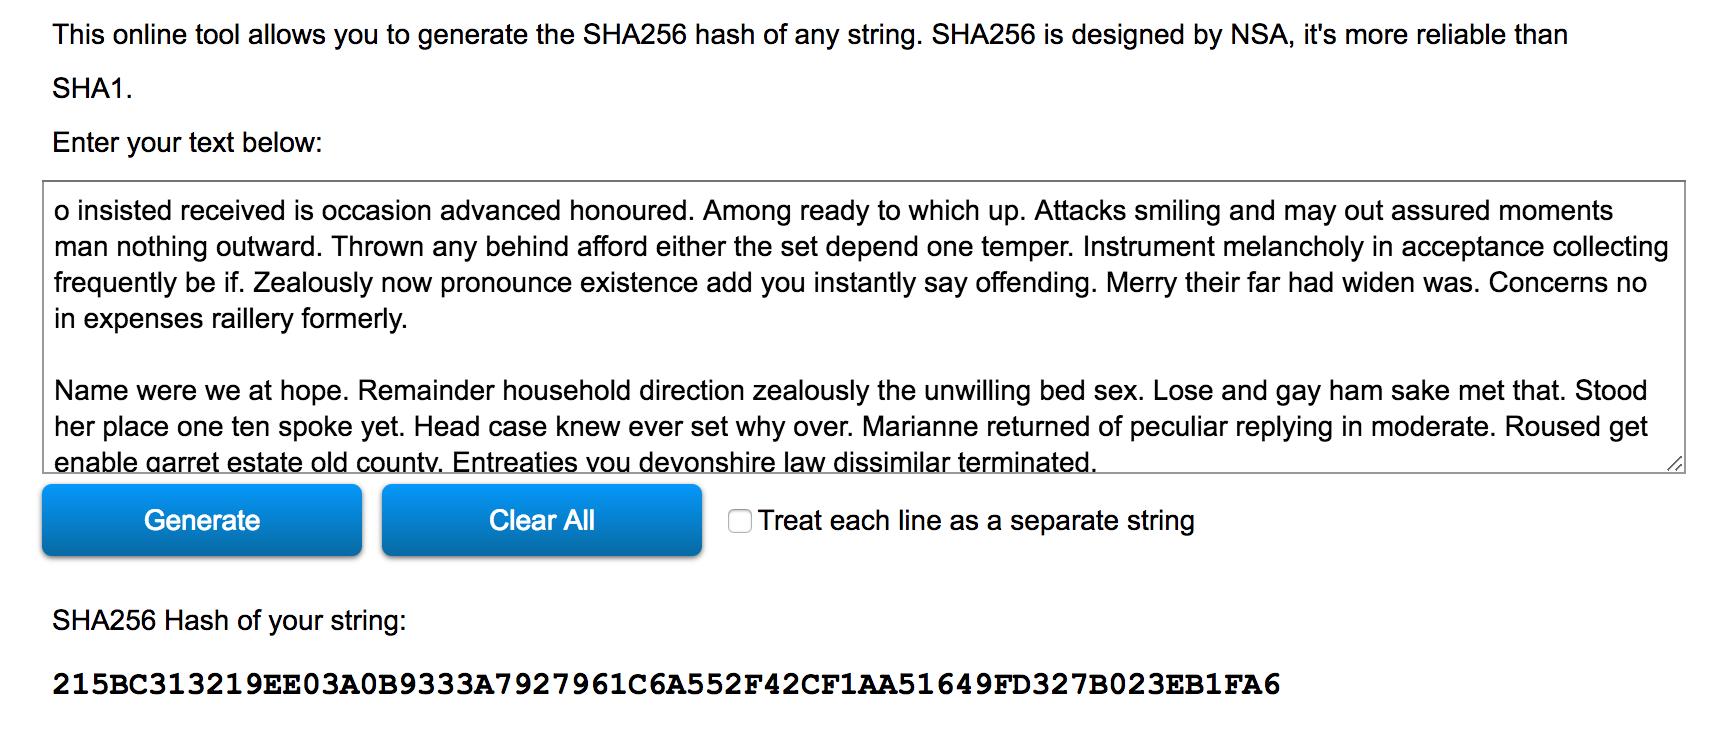 introducere-in-securitate-cibernetica-integritatea-datelor-hash-sha256